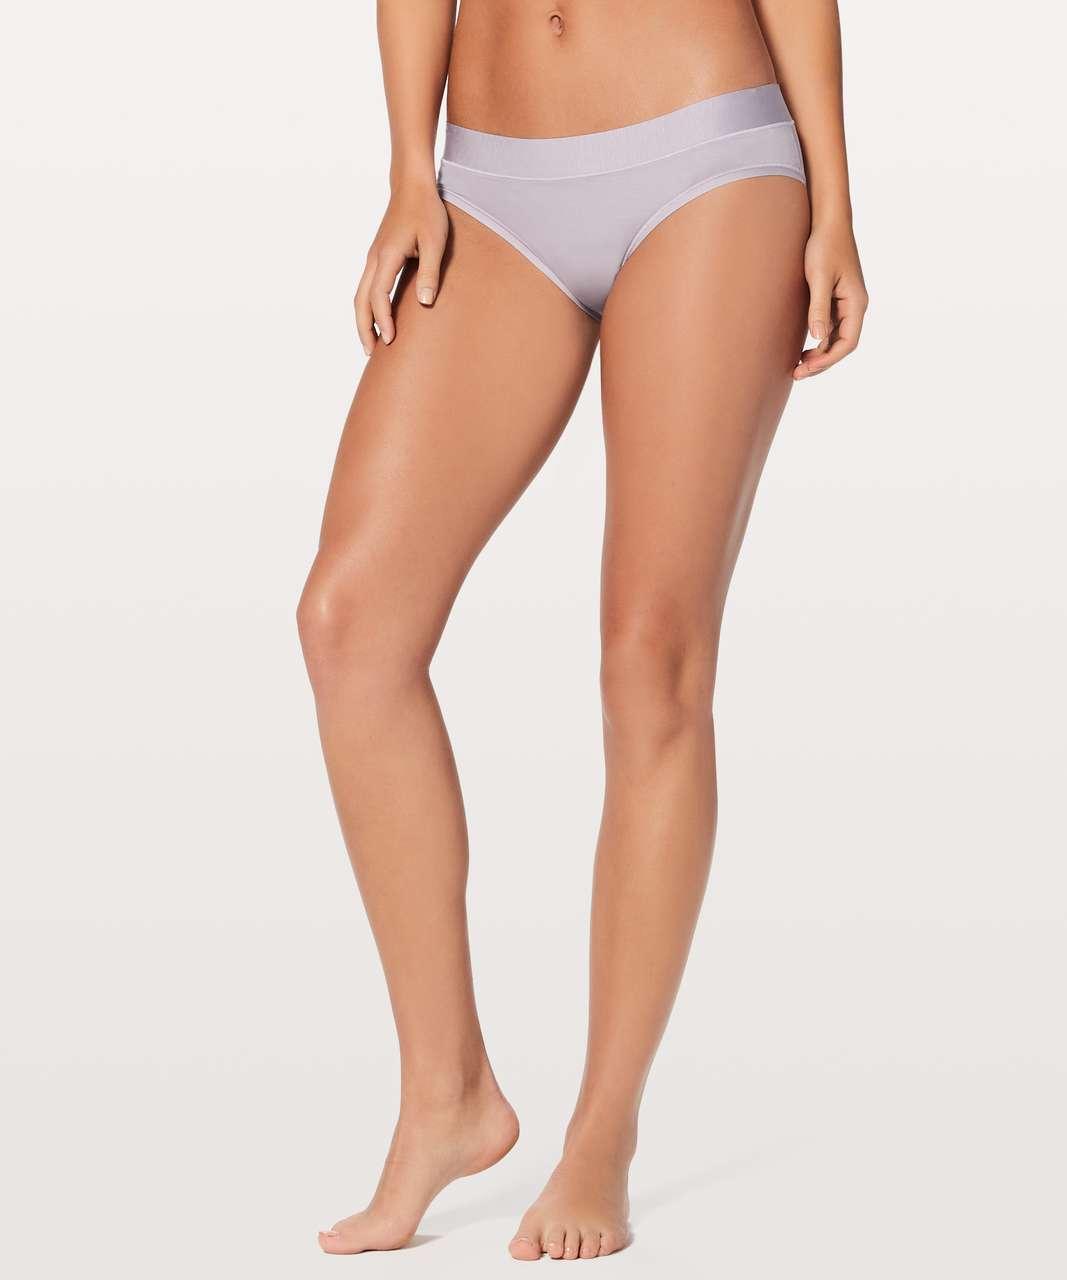 Lululemon Mula Bandhawear Bikini - Faint Lavender